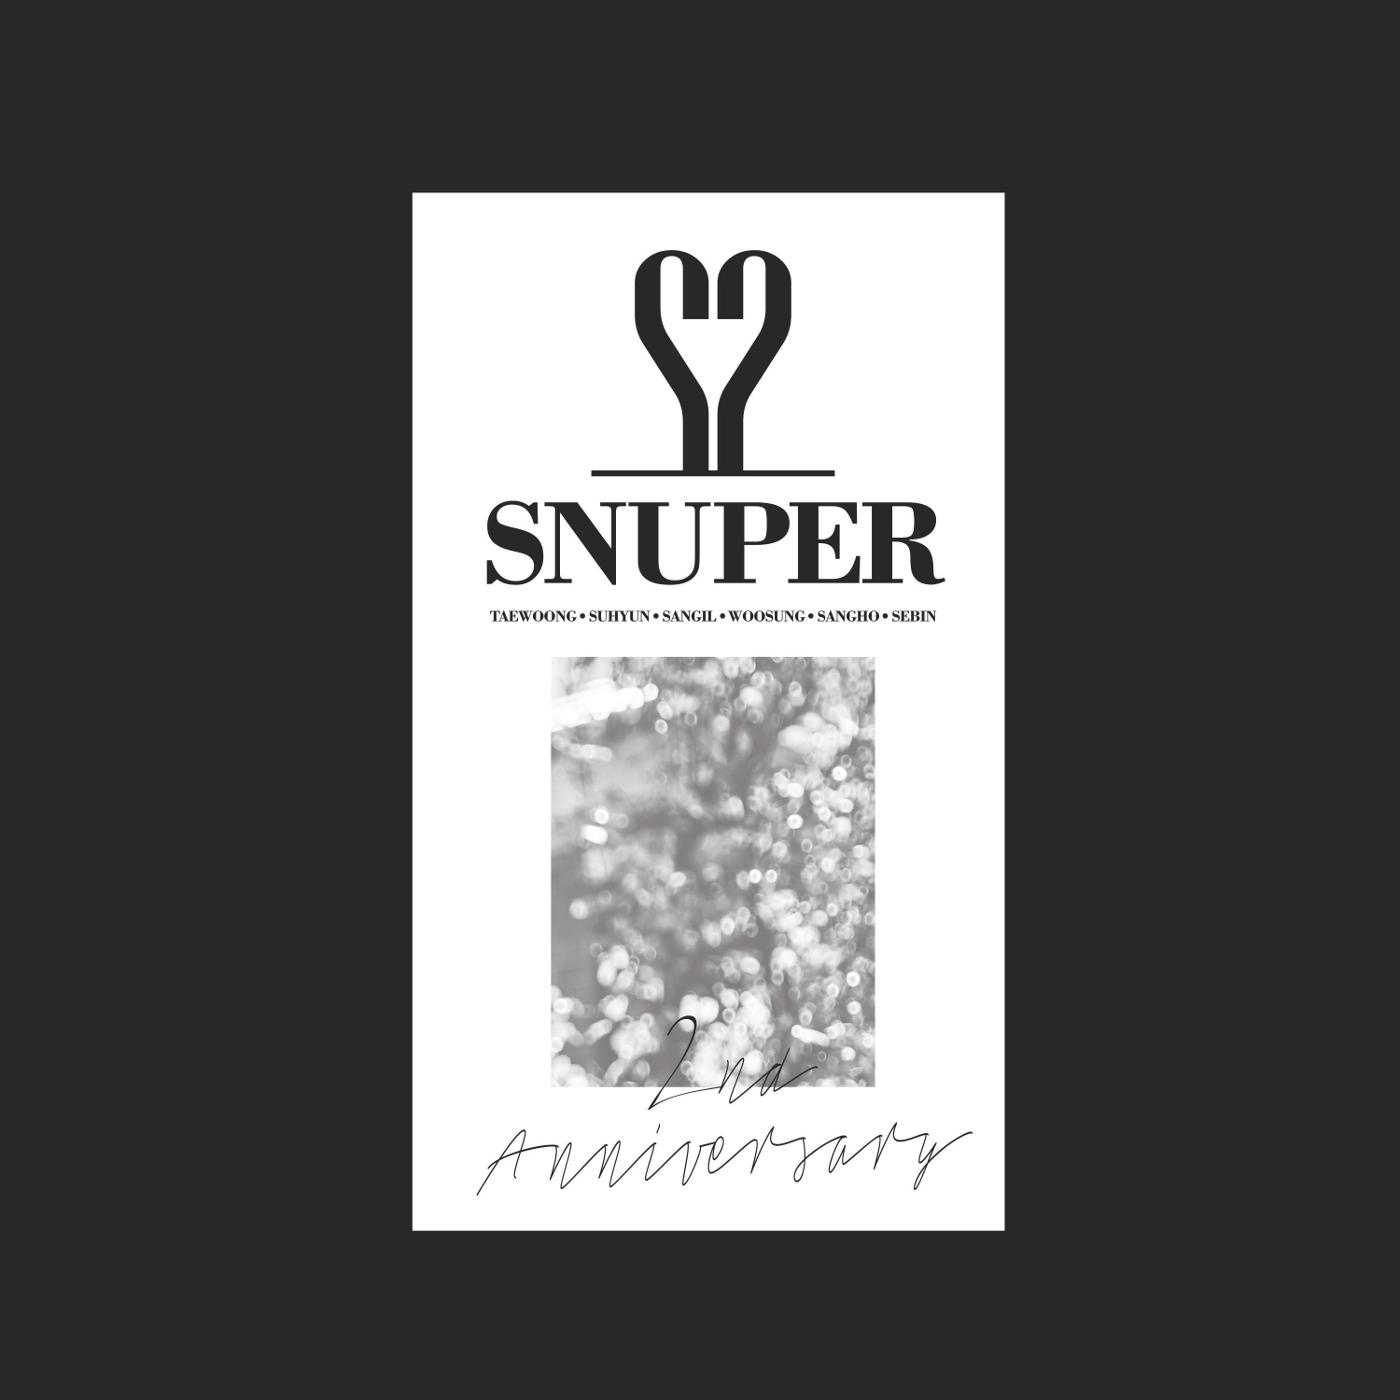 Dear (SNUPER)